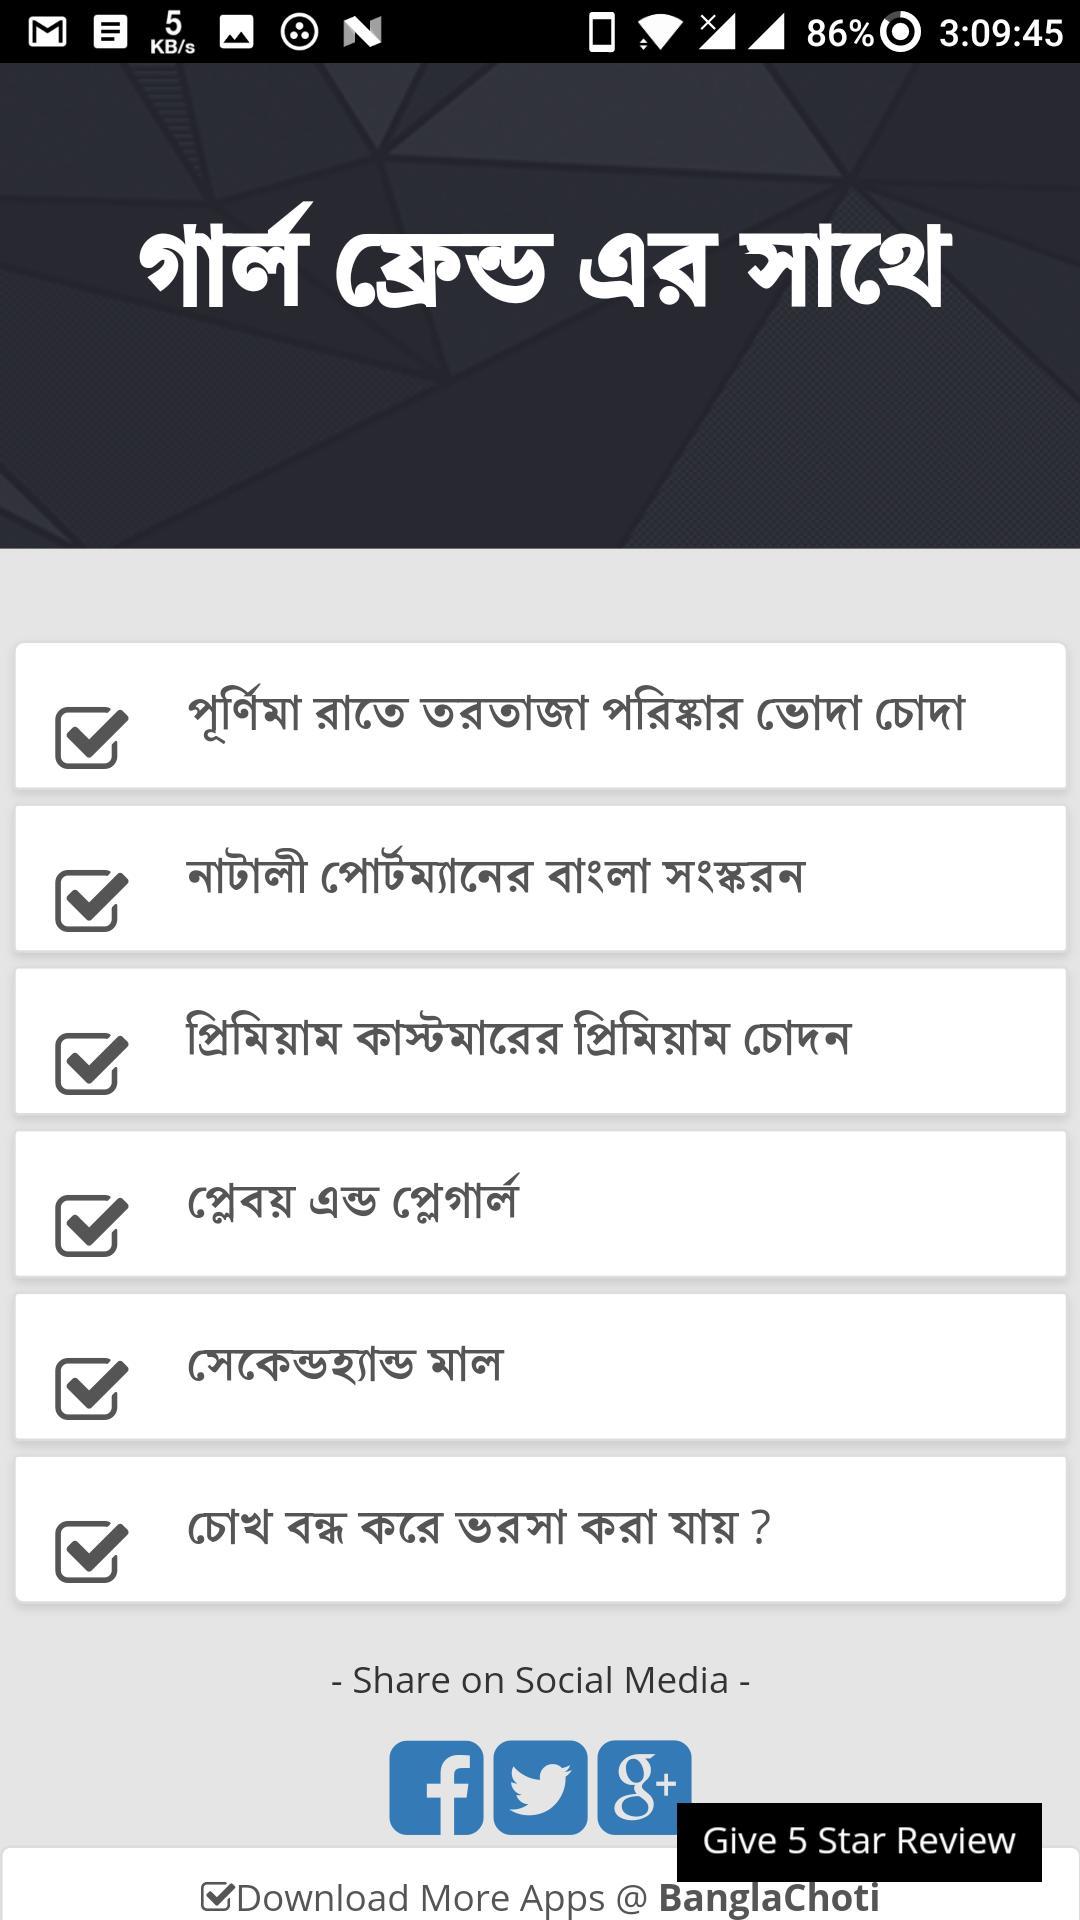 Bangla Choti গার্ল ফ্রেন্ড ( gf ) এর সাথে - bangla